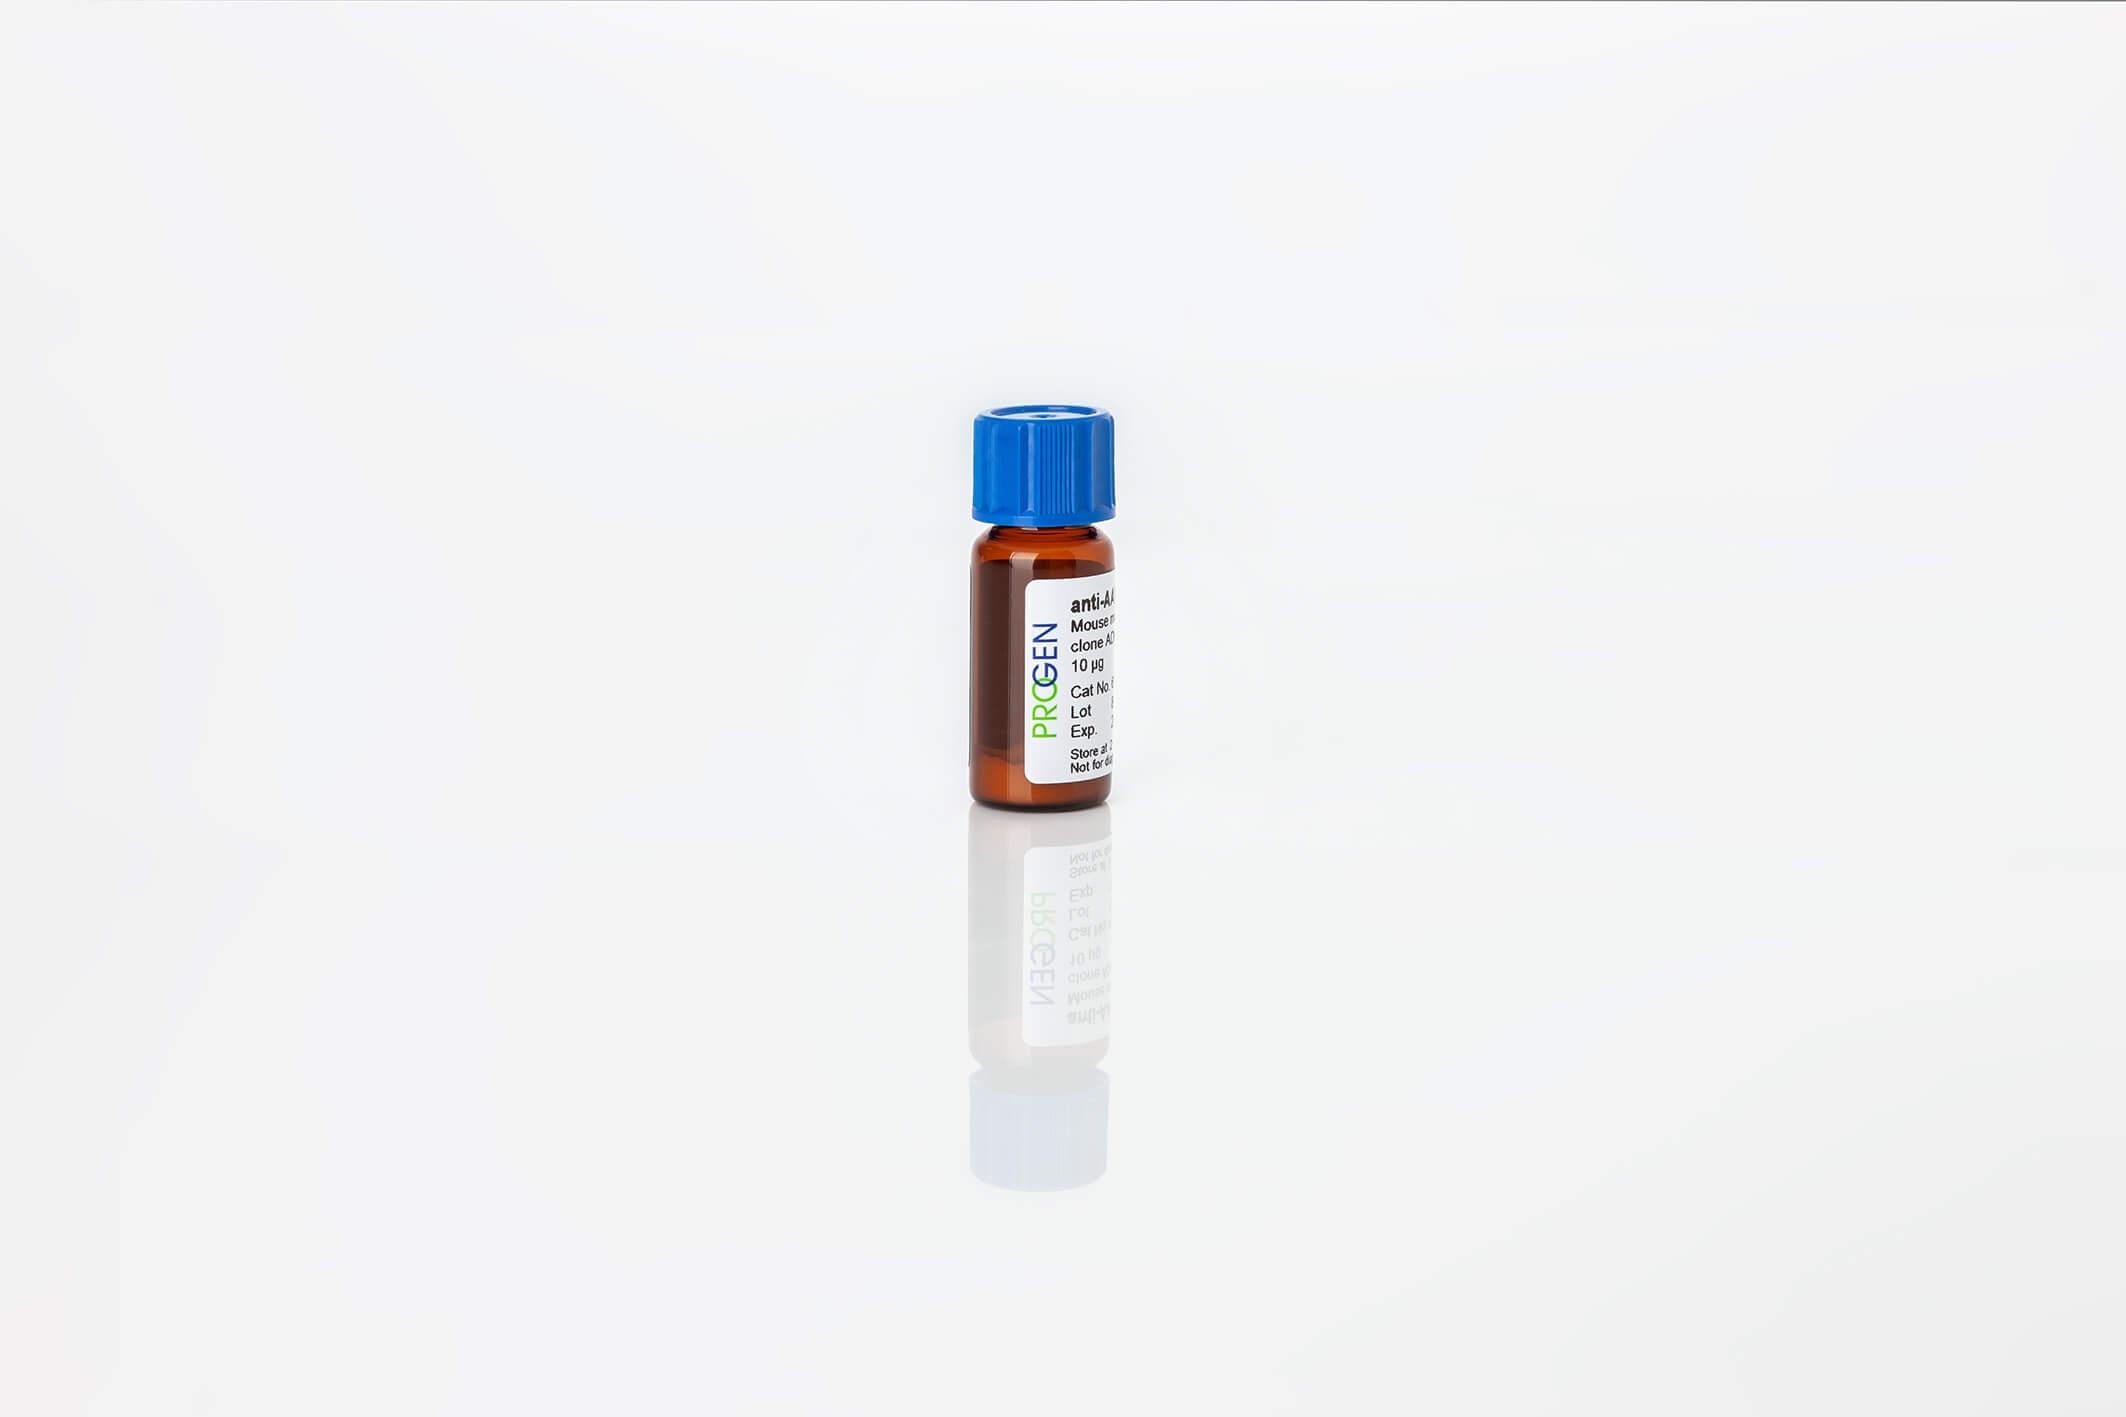 anti-Cytomegalovirus p65 mouse monoclonal, CMV-227, purified